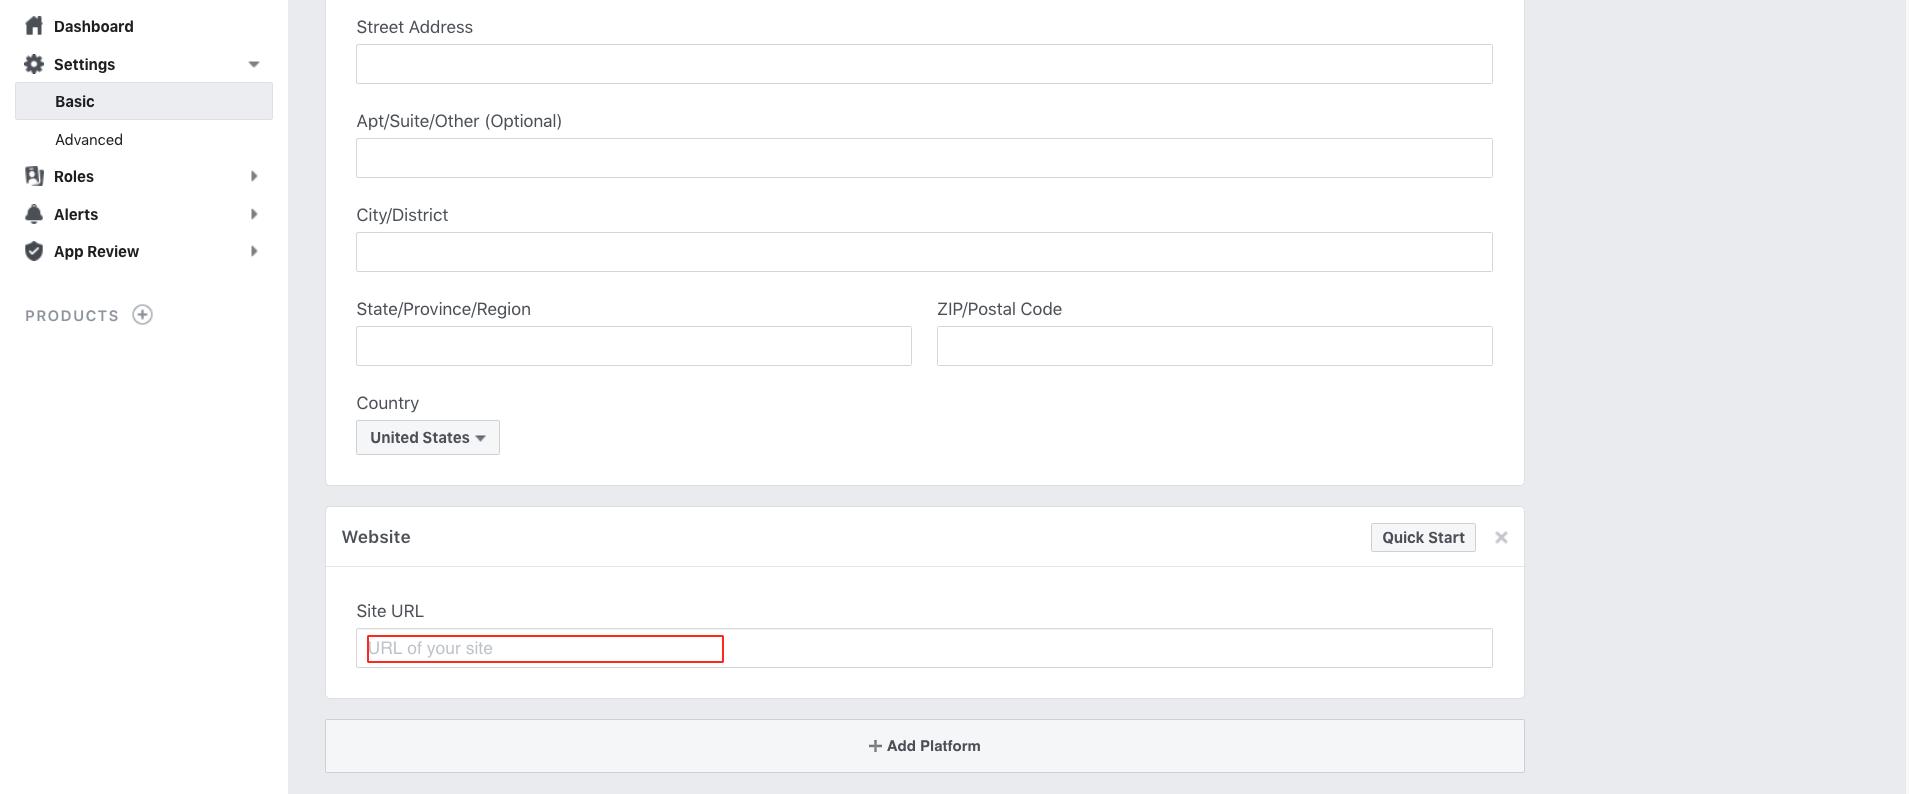 How to get your Facebook App's APP ID